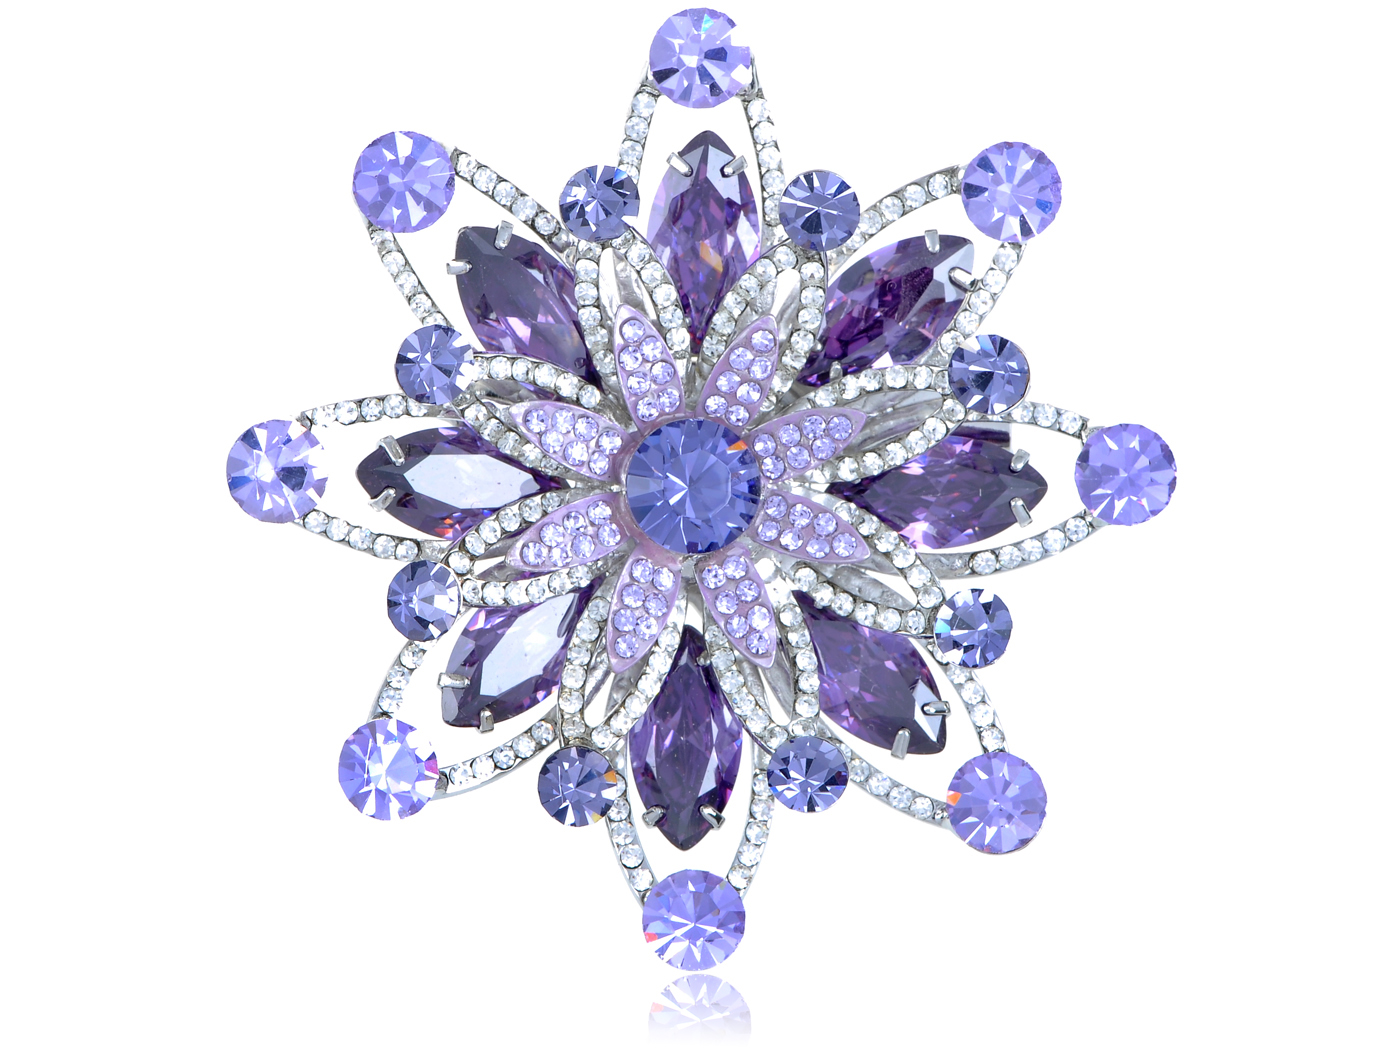 Amethyst Tanzanite Violet Swarovski Crystal Silver Tone Starburst Flower Brooch by